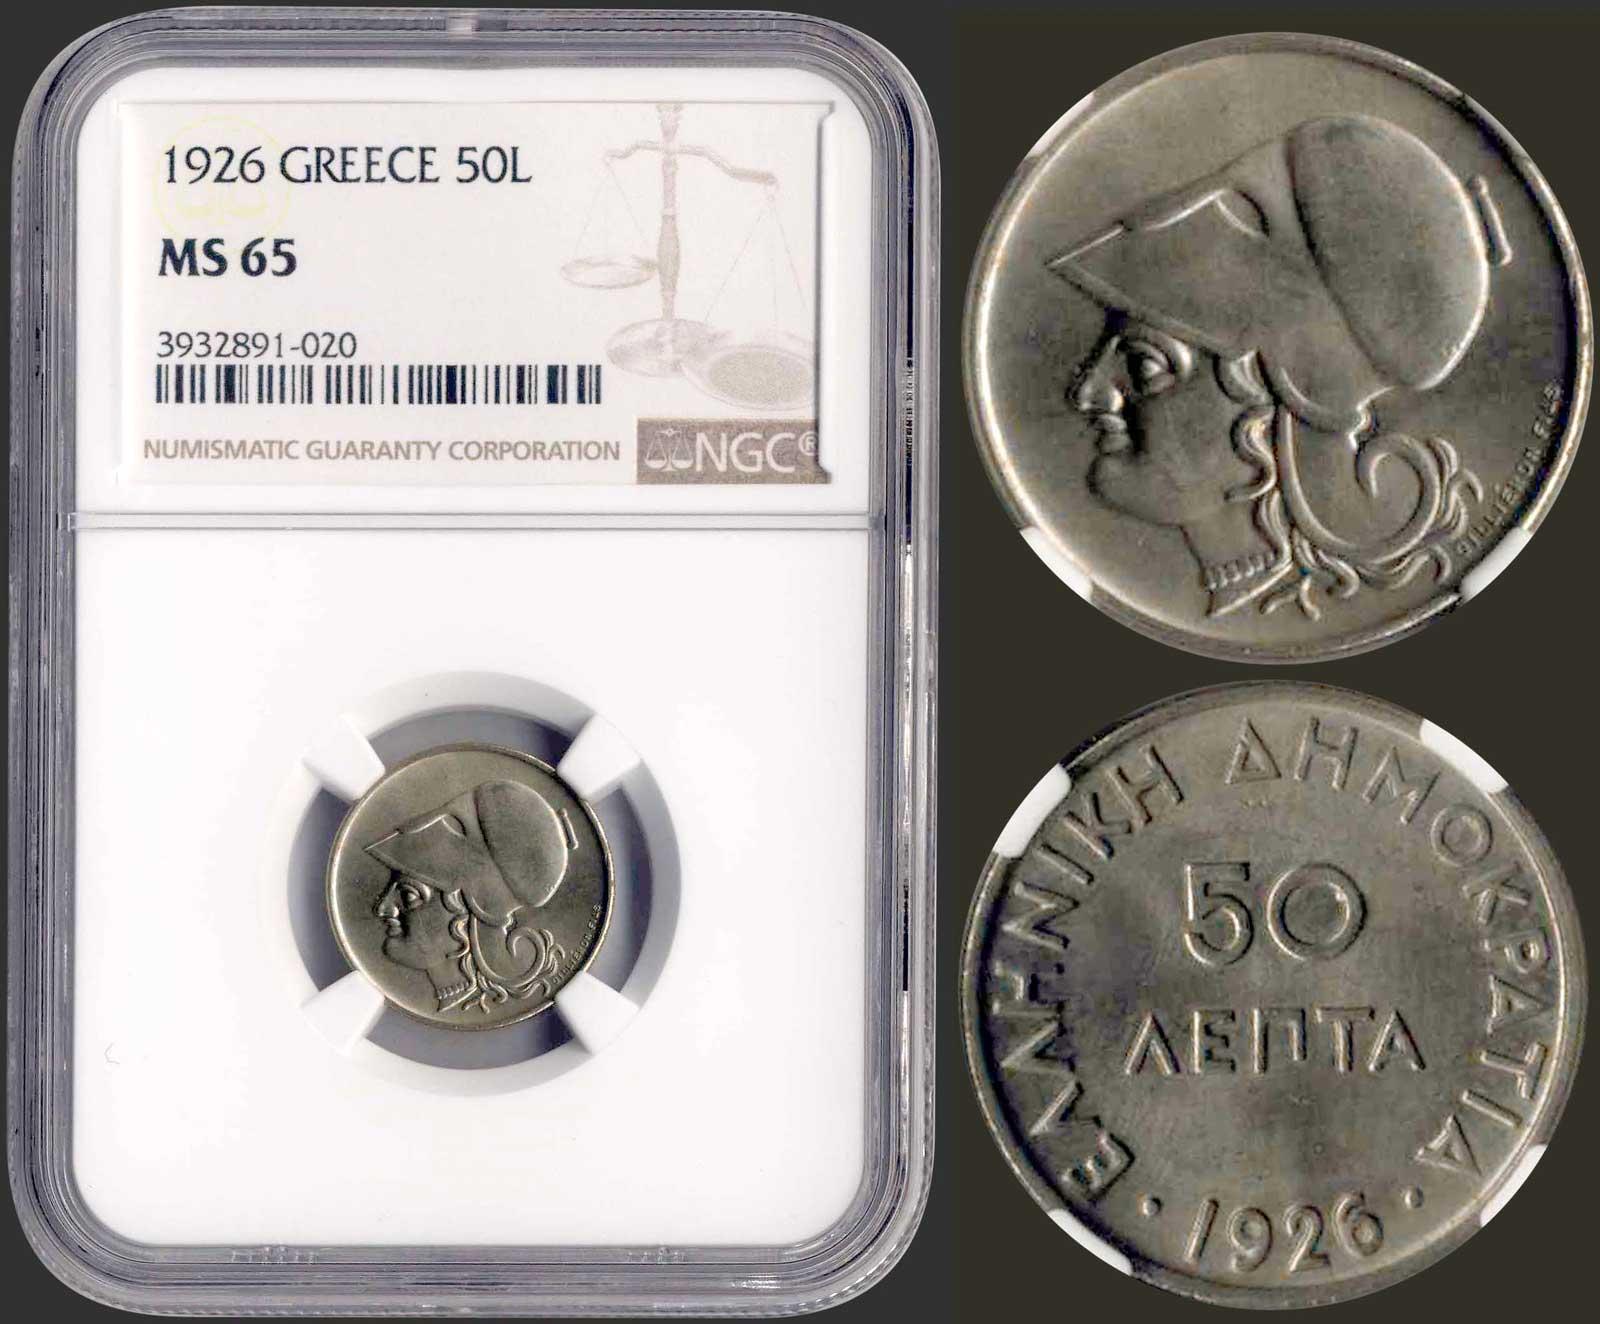 Lot 9109 - GREECE-  COINS & TOKENS 1924-1935 greek republic -  A. Karamitsos Public & LIVE Bid Auction 610 Coins, Medals & Banknotes